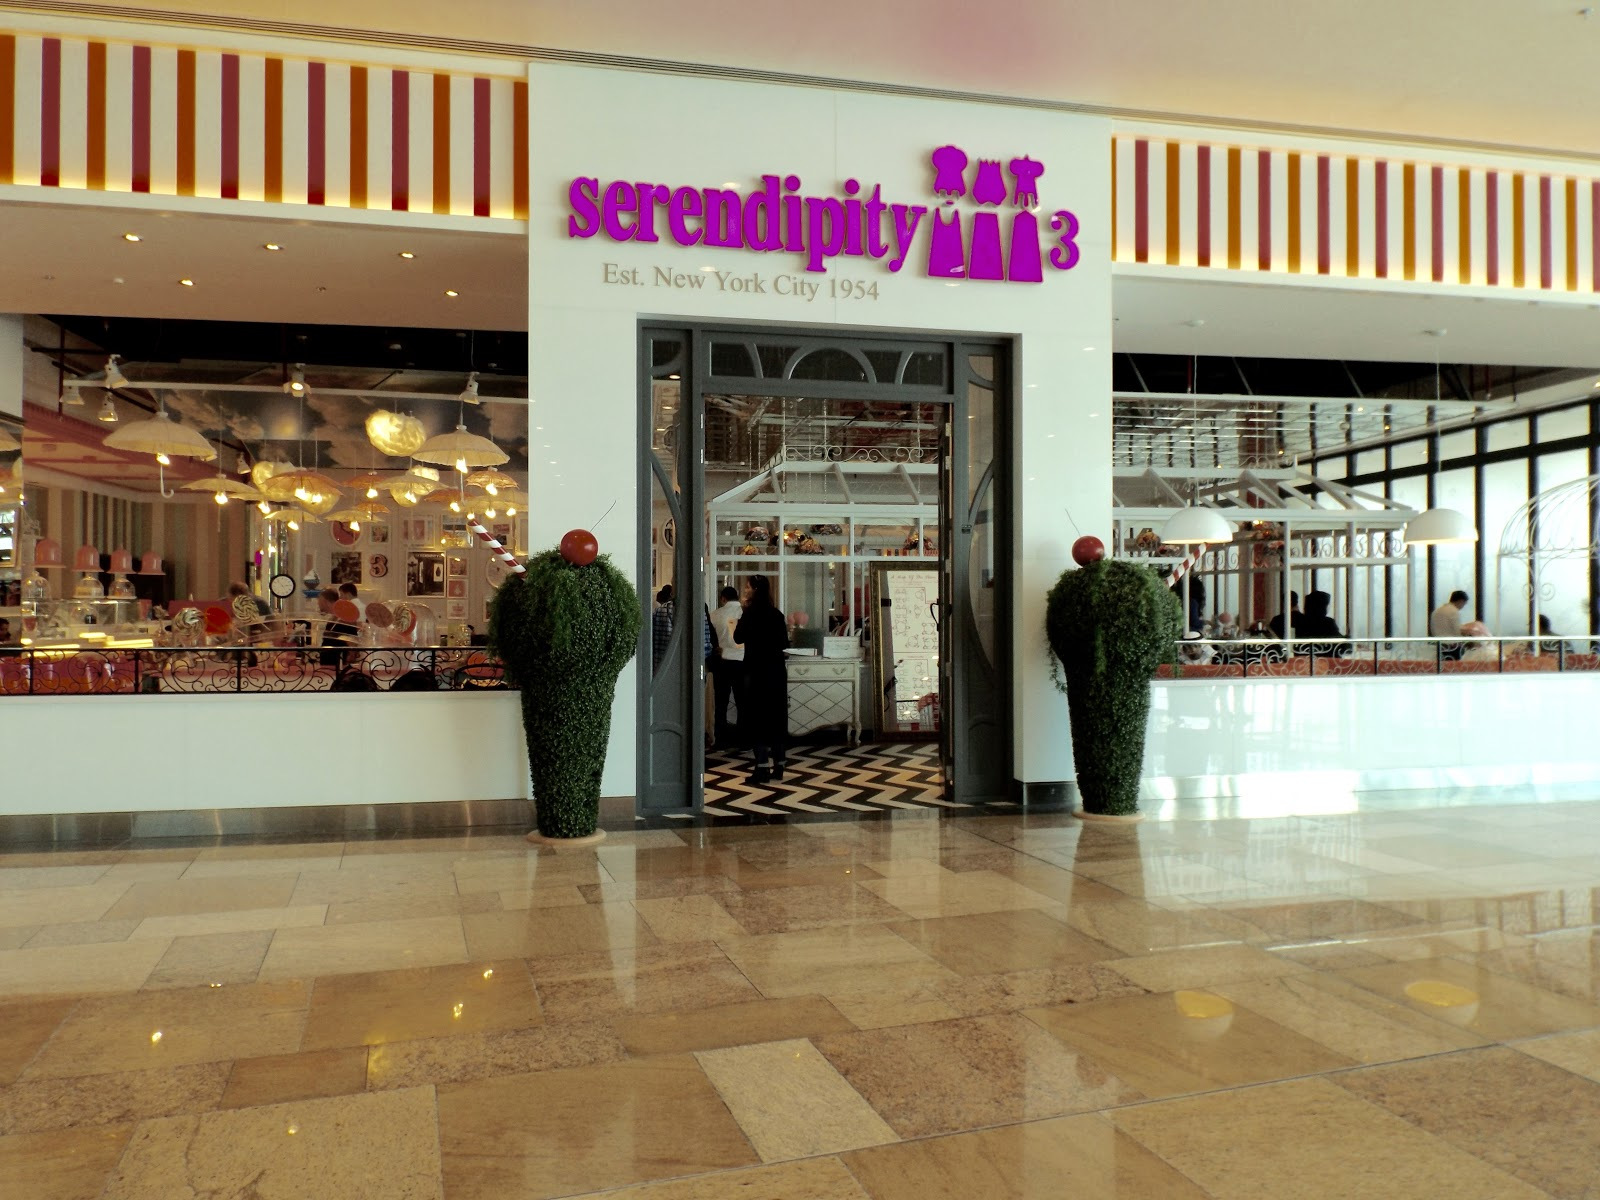 Serendipity 3 in the UAE | Dubai Desert Twins